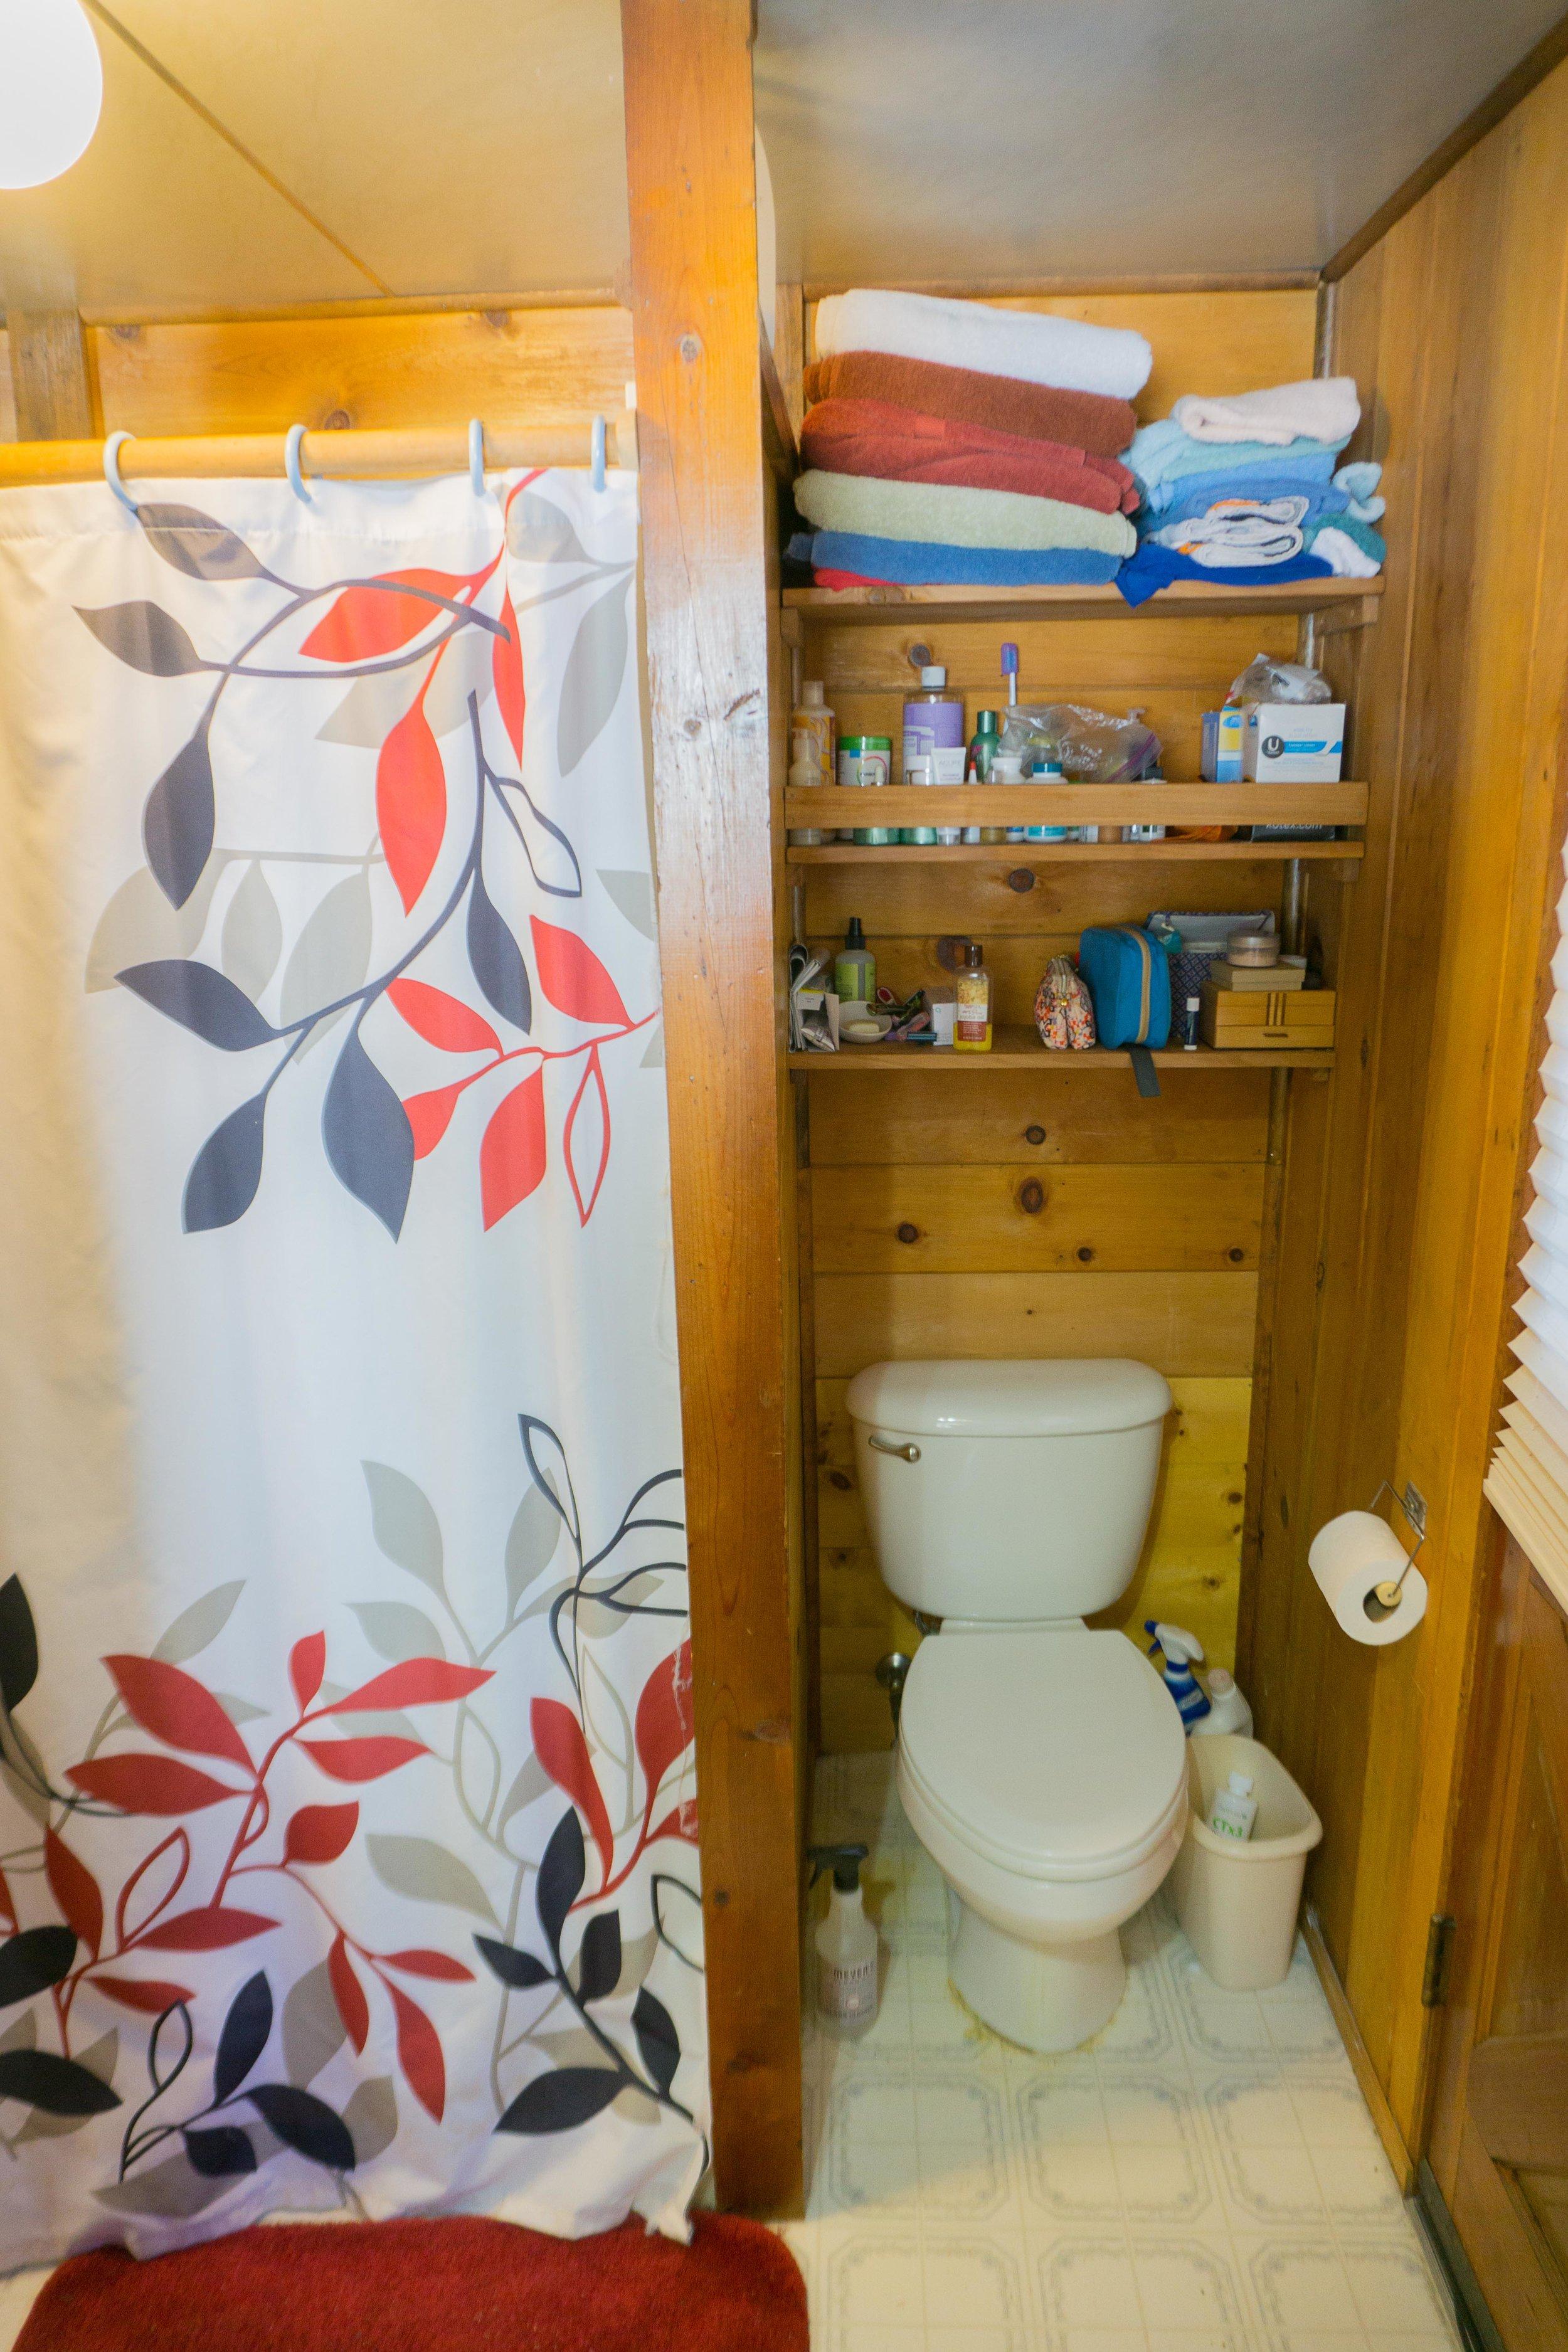 AirbnbHouse-05779.jpg